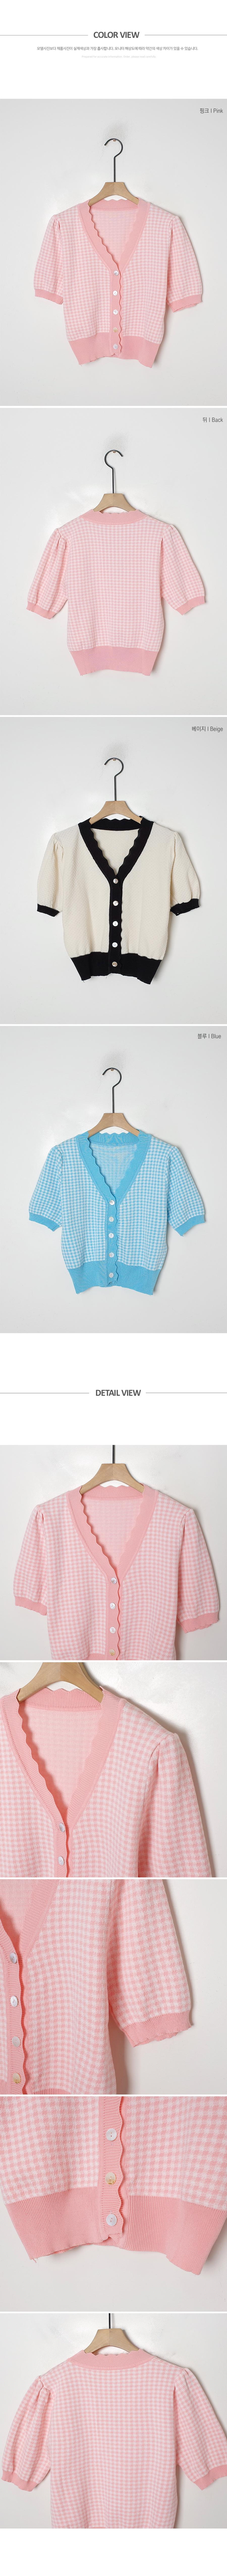 Teen Star Check Short Sleeve Cardigan